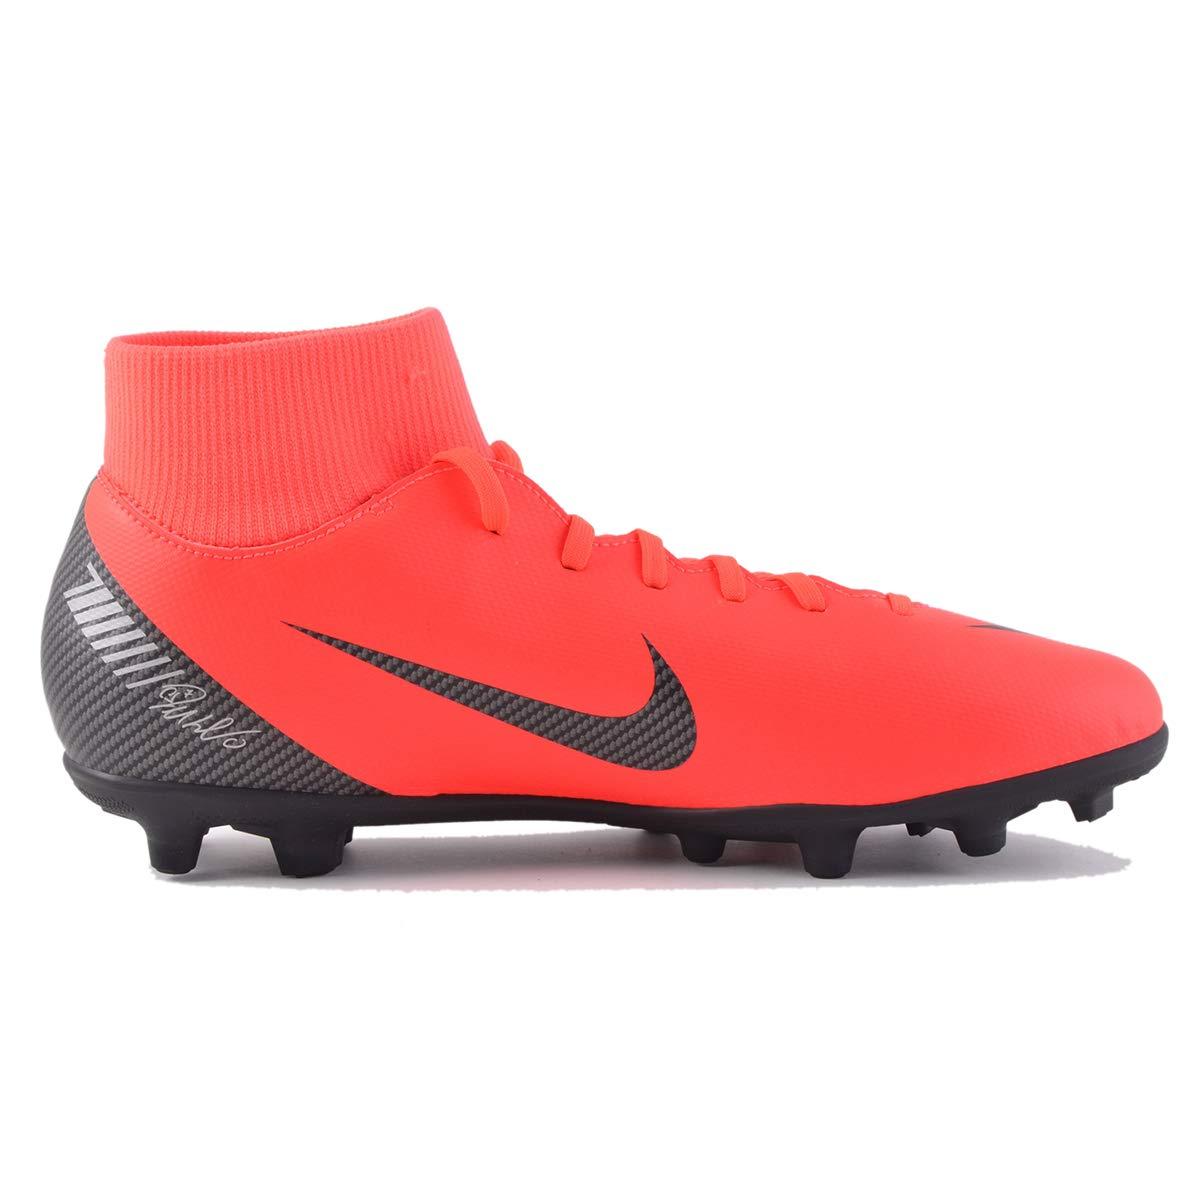 Nike Mercurial Superfly 6 Club CR7 MG Soccer Cleat (Bright Crimson) (Men's 7/Women's 8.5)